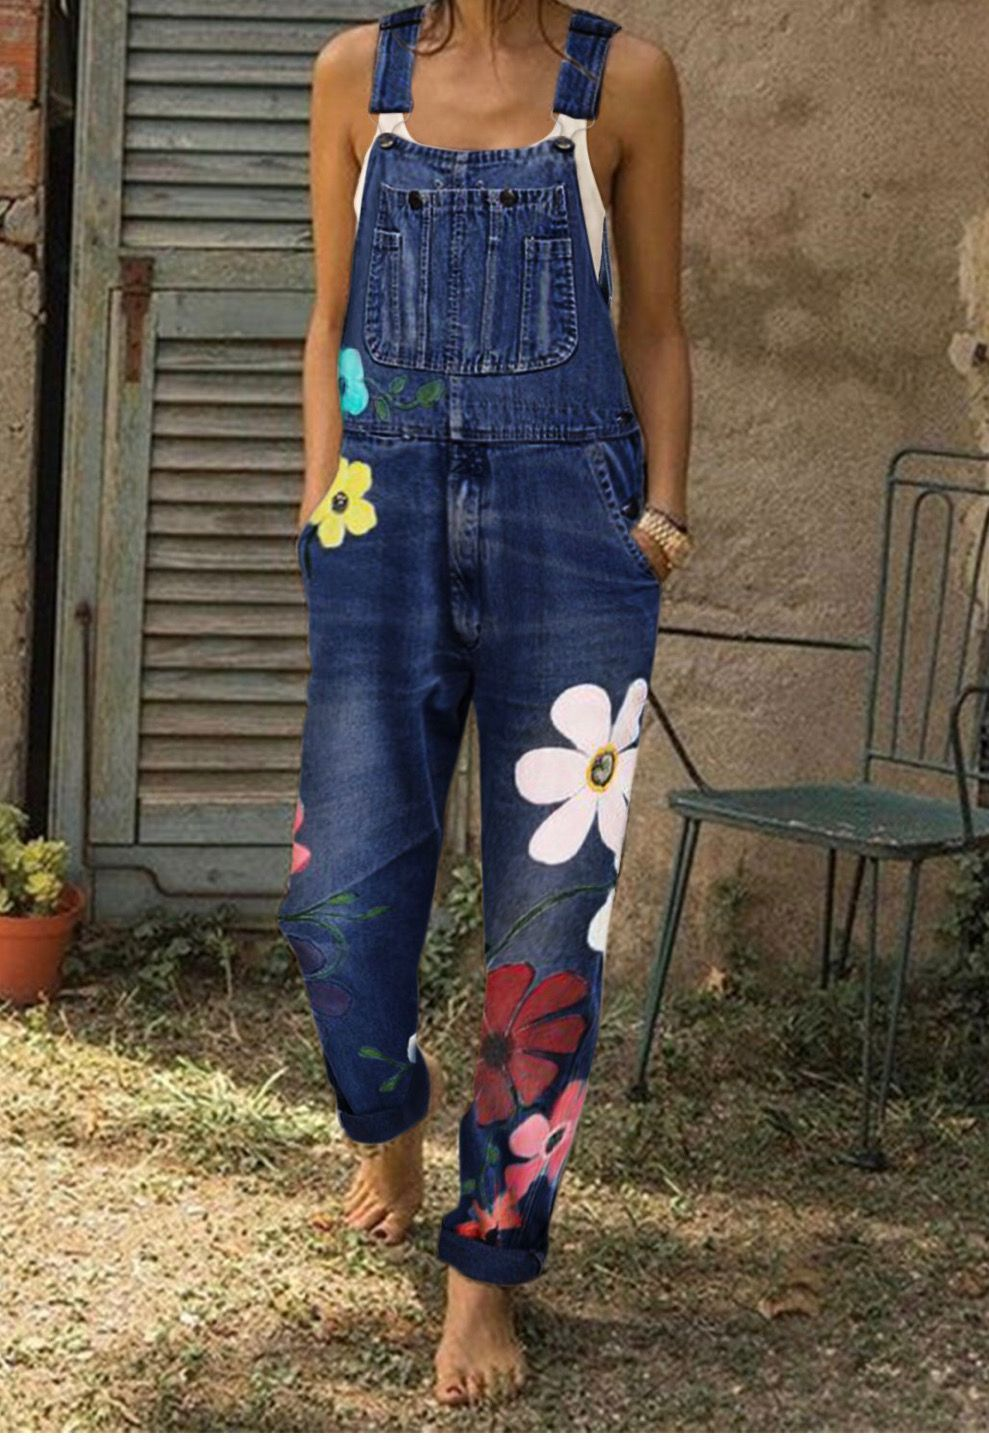 Moda Donne Denim Benda Volant Tute Senza Maniche Pantaloni Lunghi Playsuit